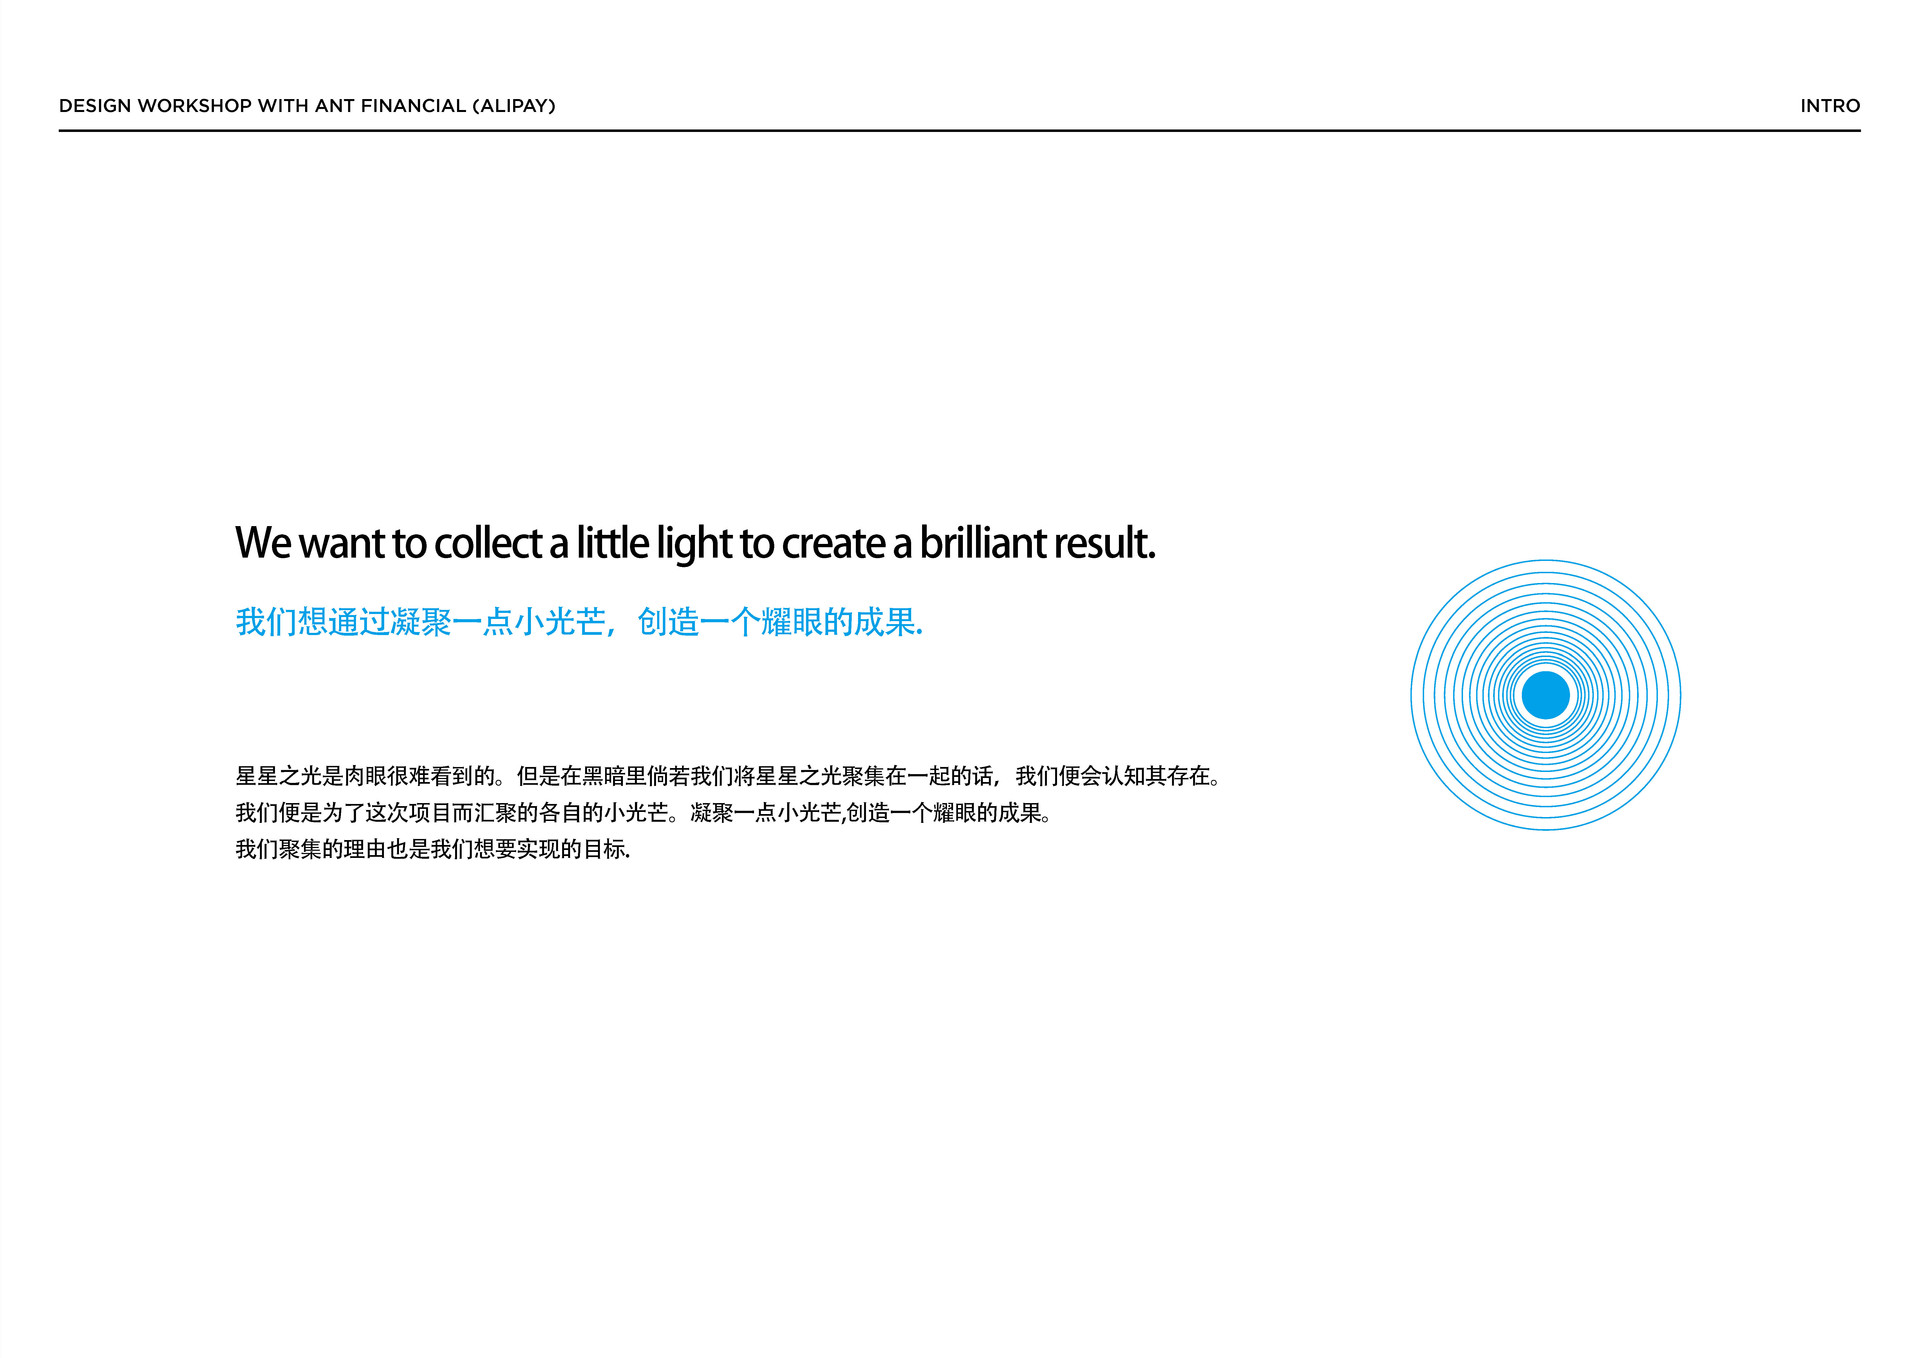 alipay_workshop_中文_페이지_04.jpg